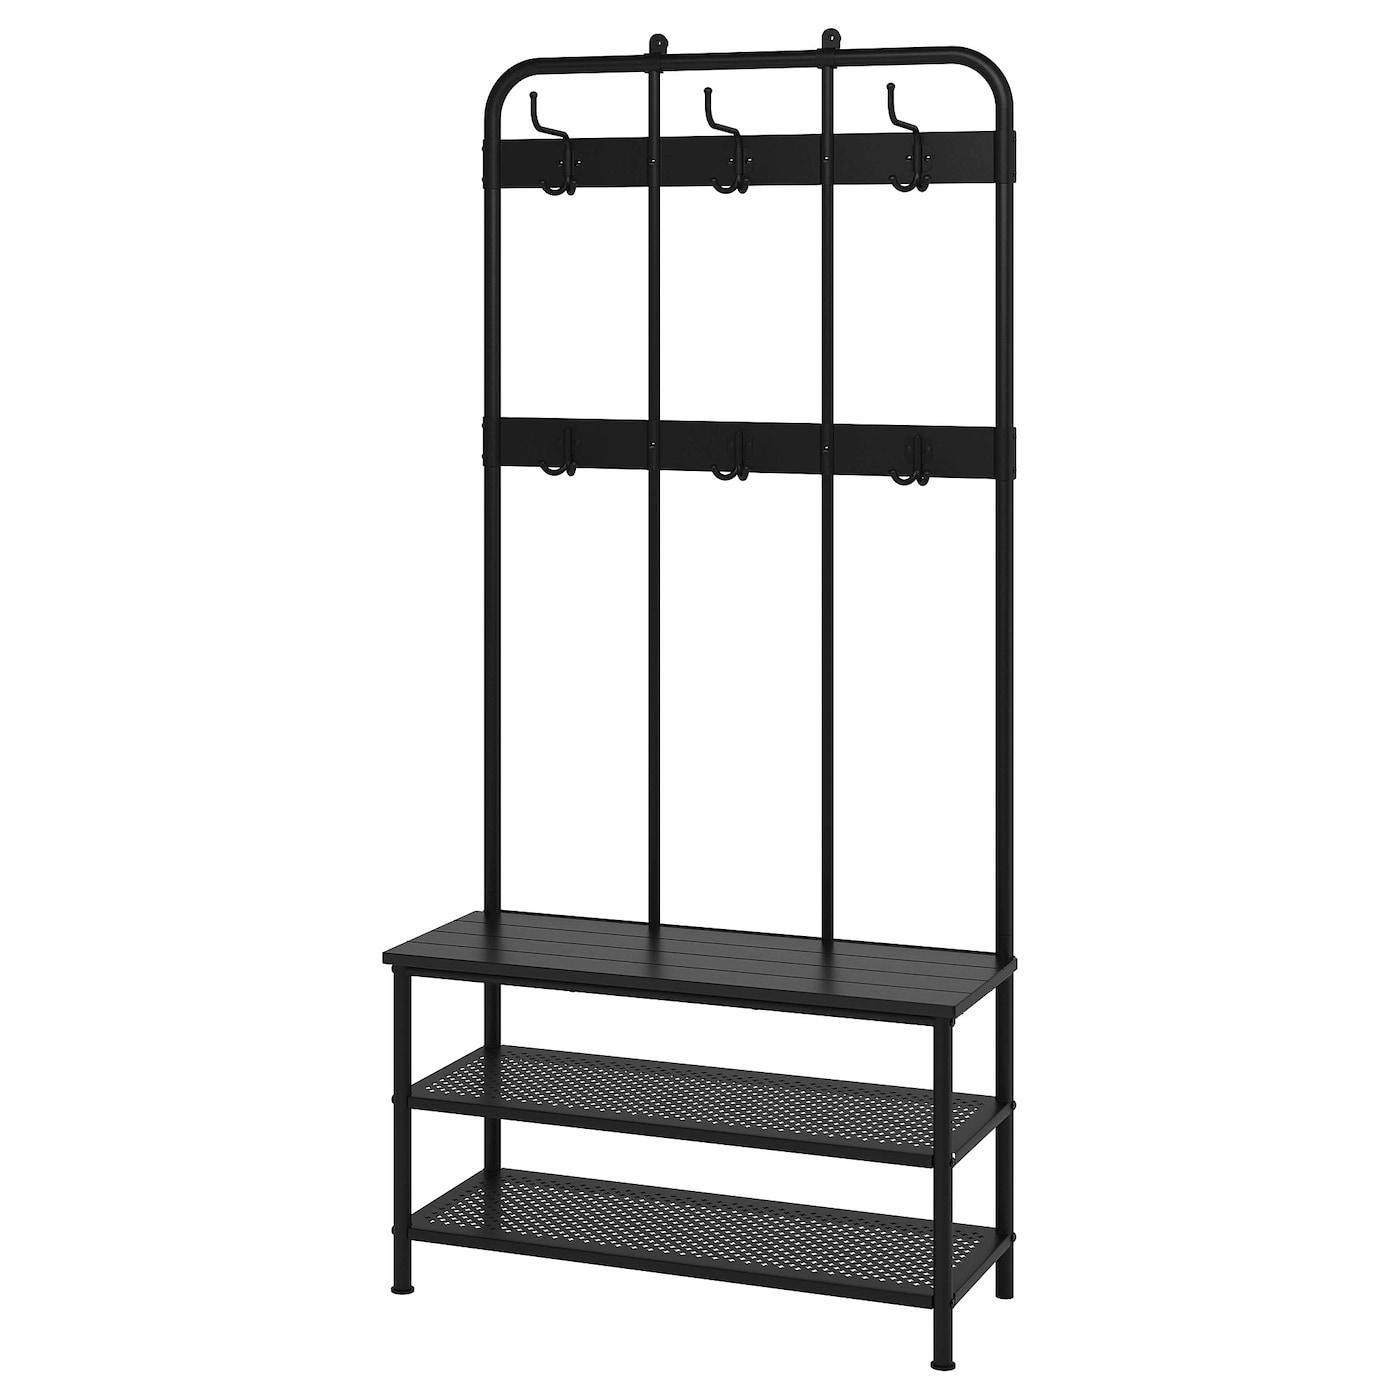 g-coat-rack-with-shoe-storage-bench-black__0710689_PE727714_S5